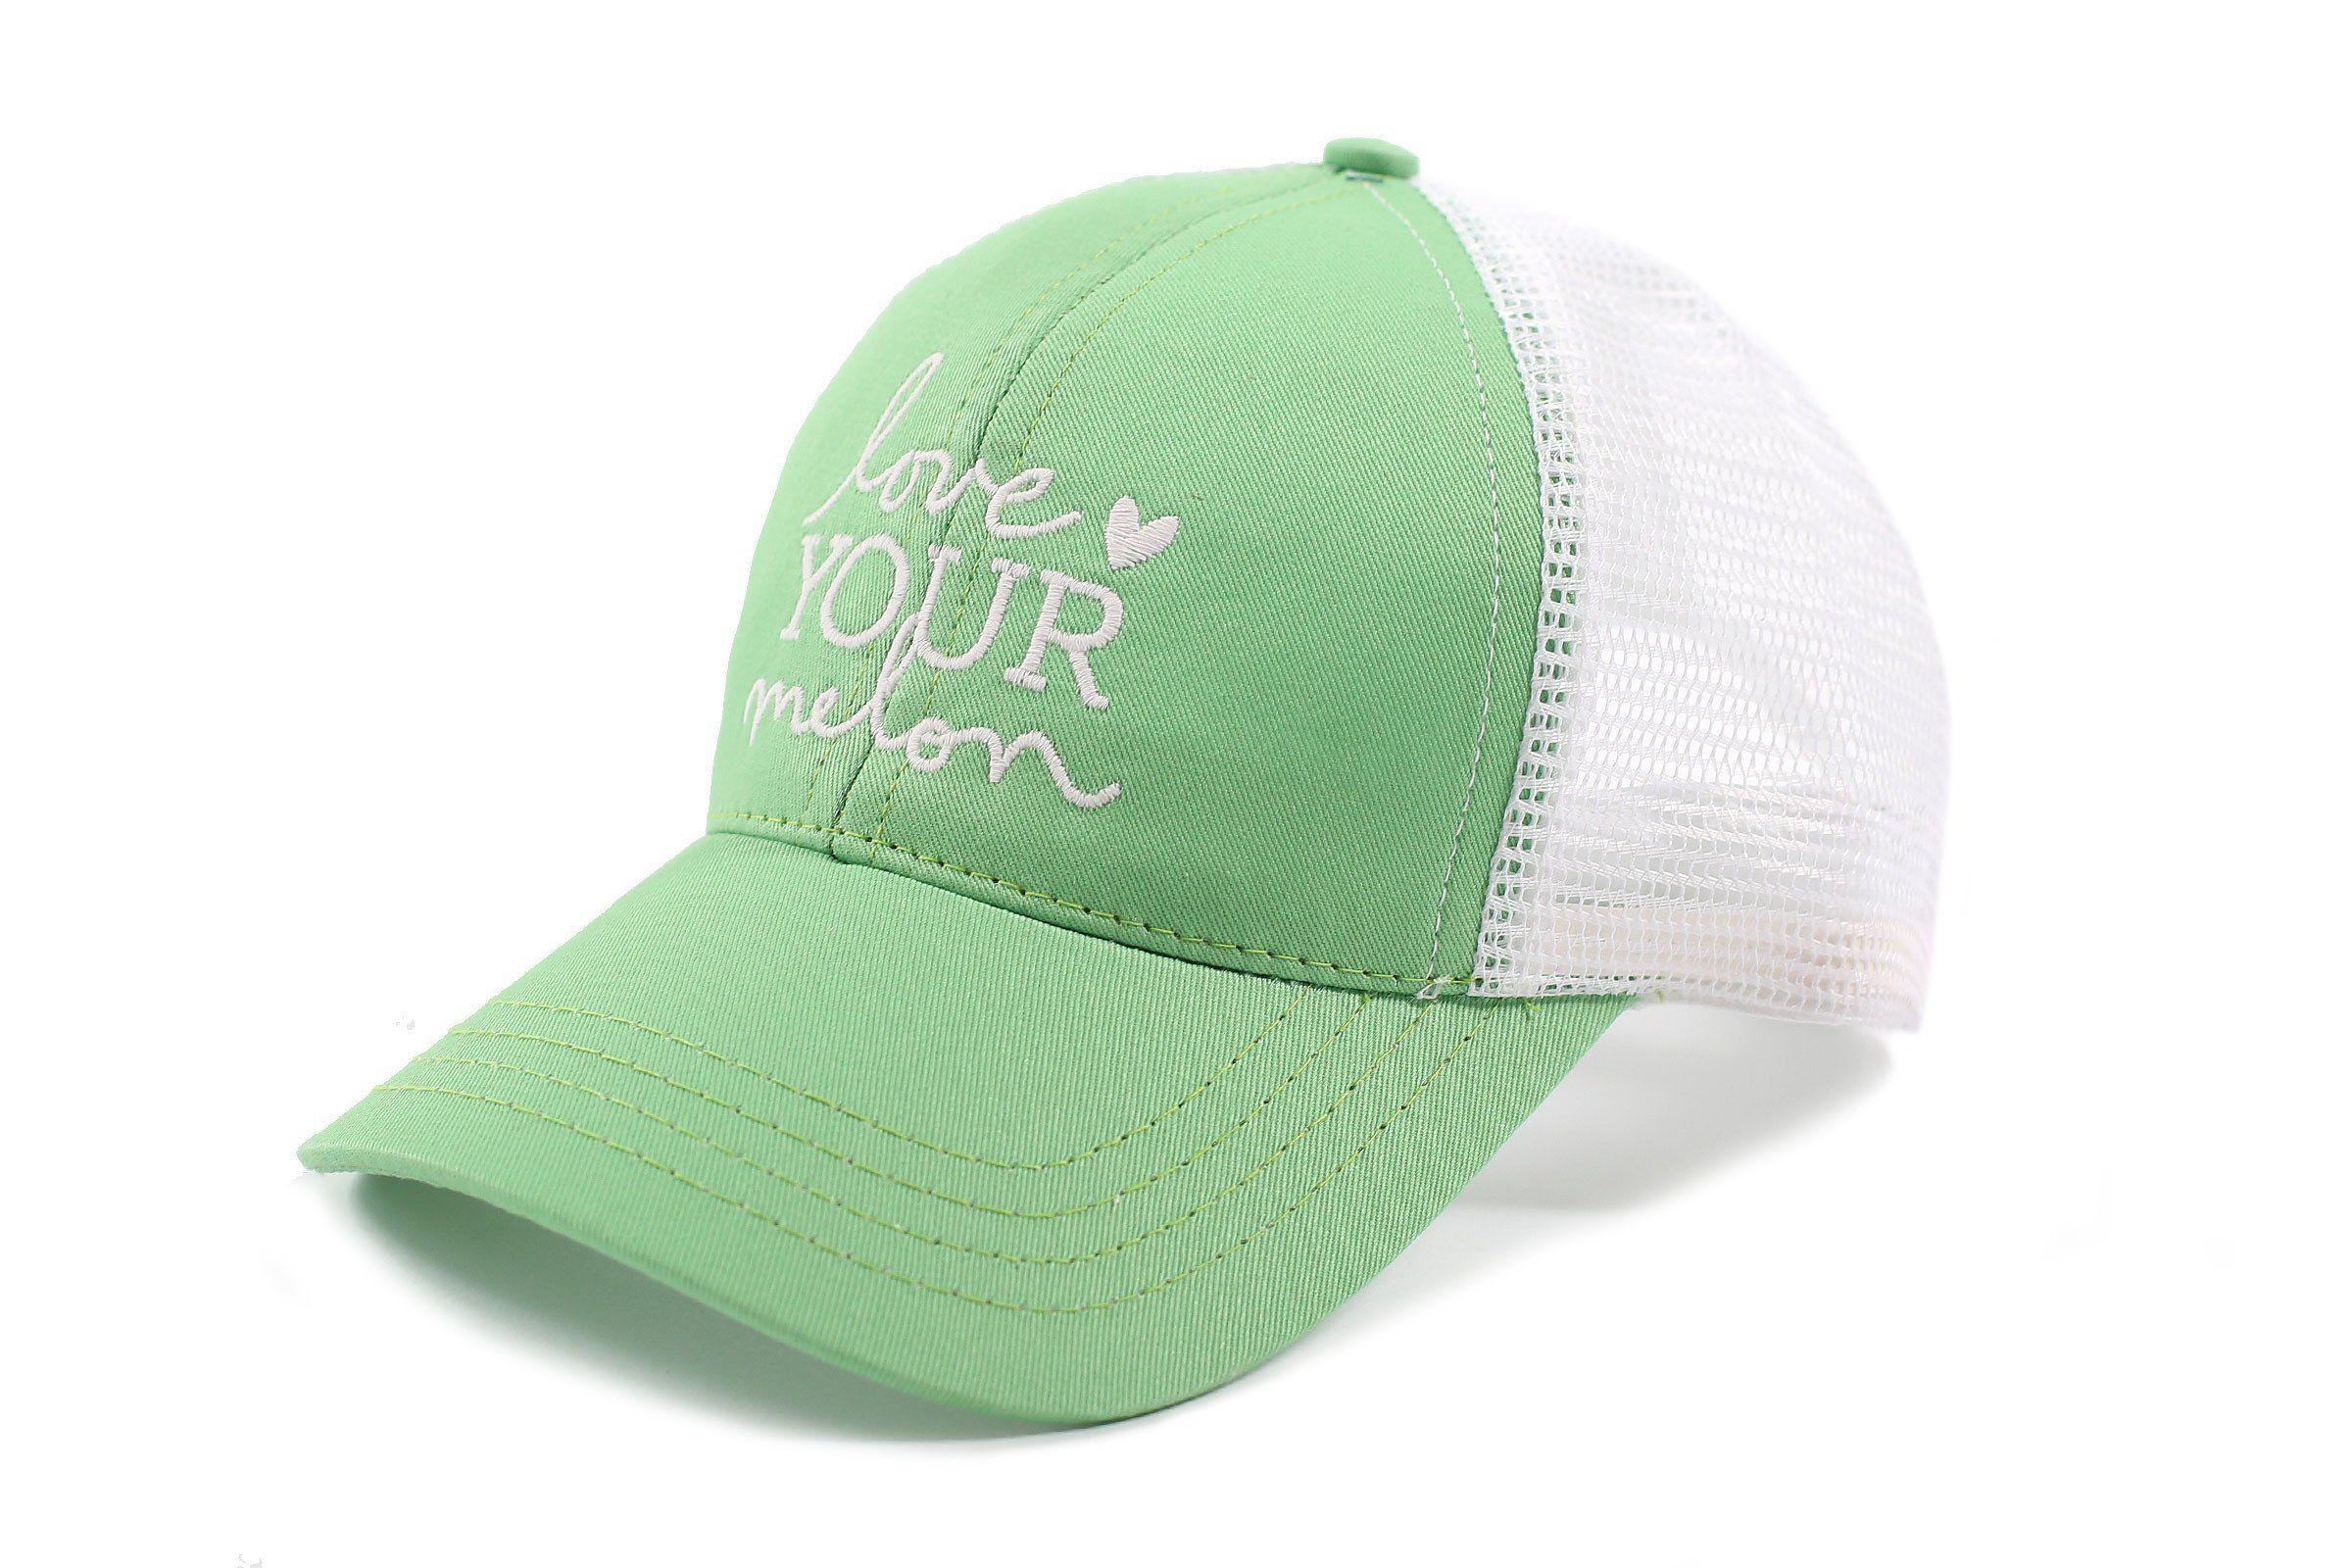 ... Love Your Melon. Greengage Mesh Cap 71b1e1de73a3